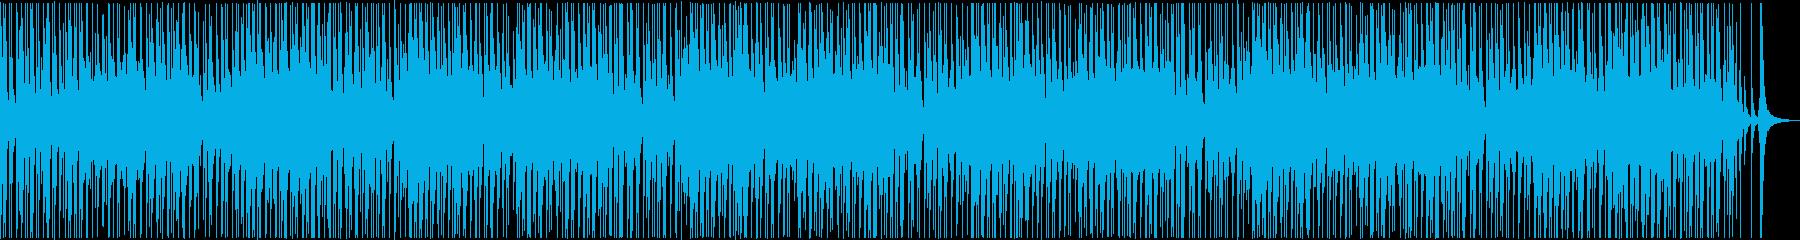 日本 和風 茨城県民謡 猿島豊年音頭の再生済みの波形